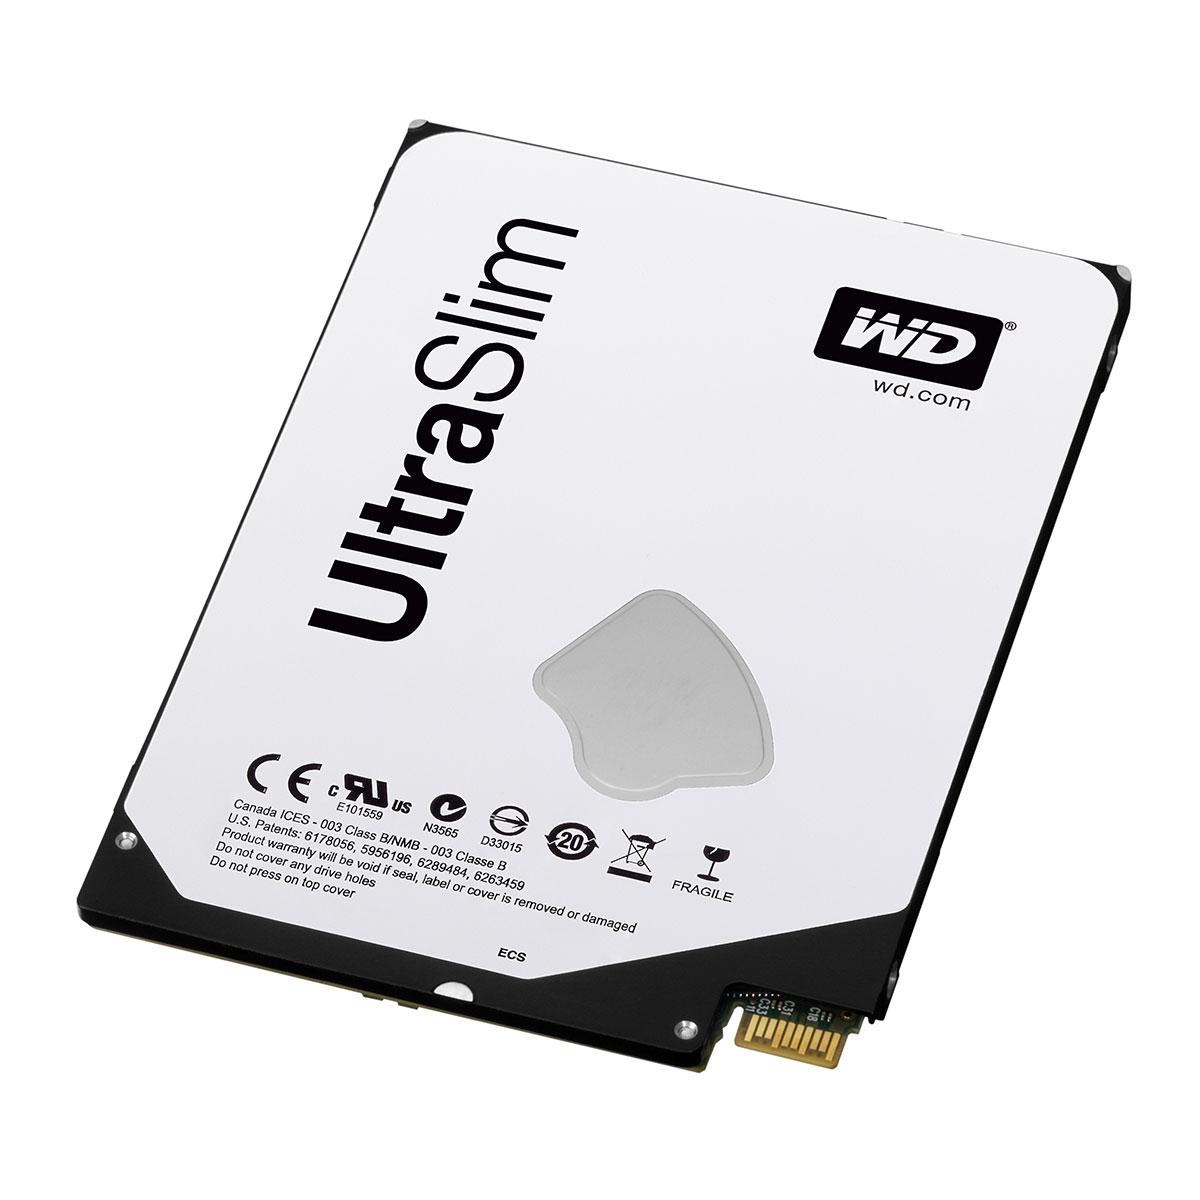 "Disque dur interne WD Blue Mobile 500 Go Ultra-Slim + Adaptateur SATA Disque dur 2.5"" 500 Go 5 mm 5400 RPM 16 Mo Serial ATA III 6 Gb/s Small Form Factor + SATA"